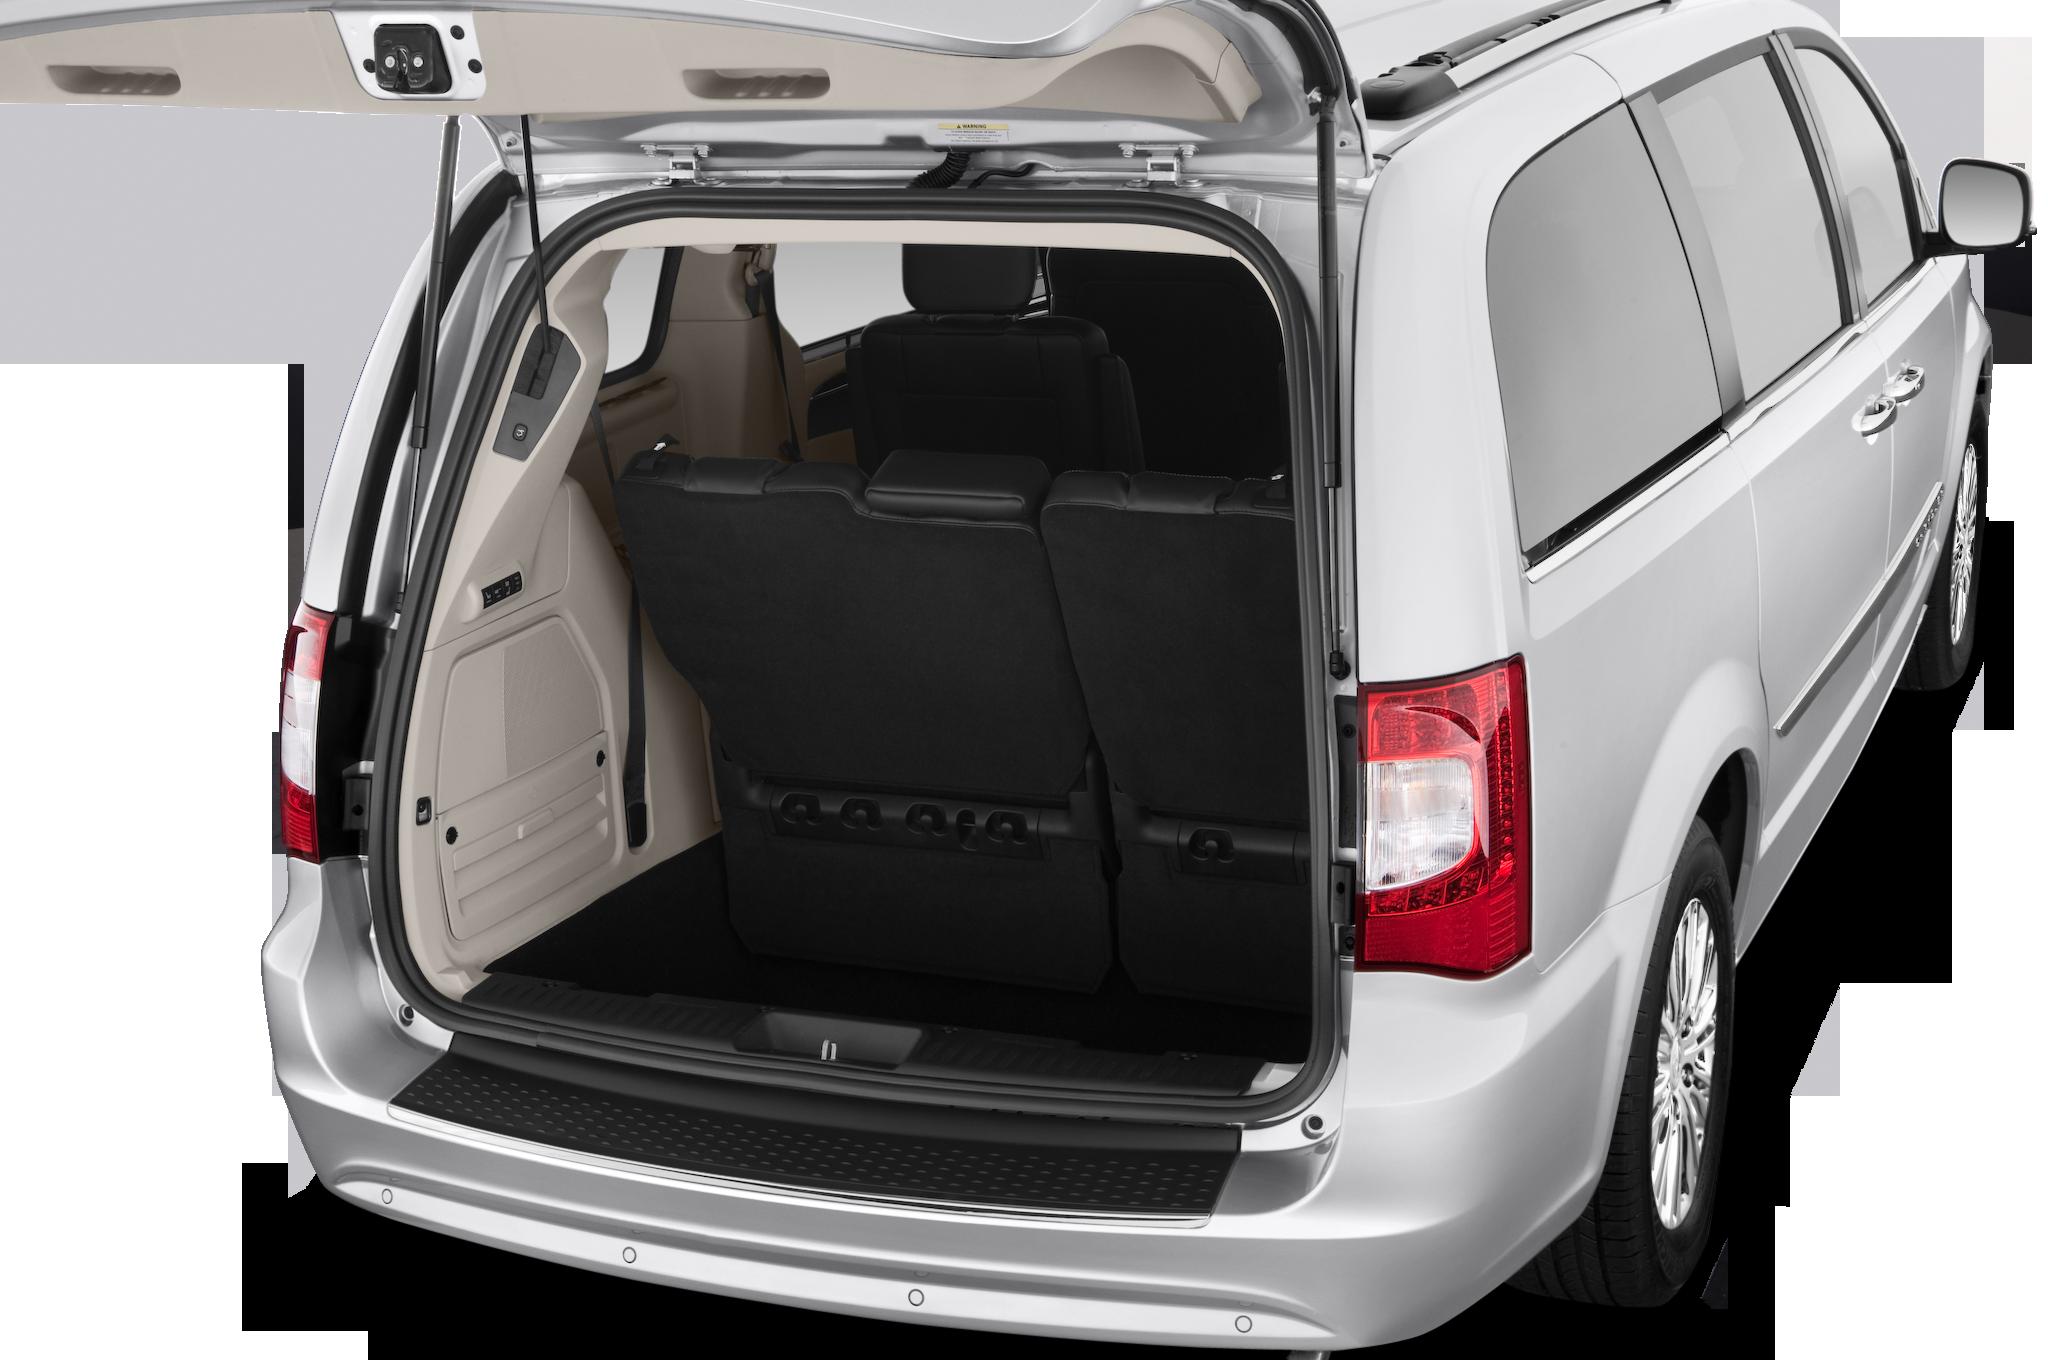 Chrysler Voyager V Restyling 2011 - 2015 Minivan #2